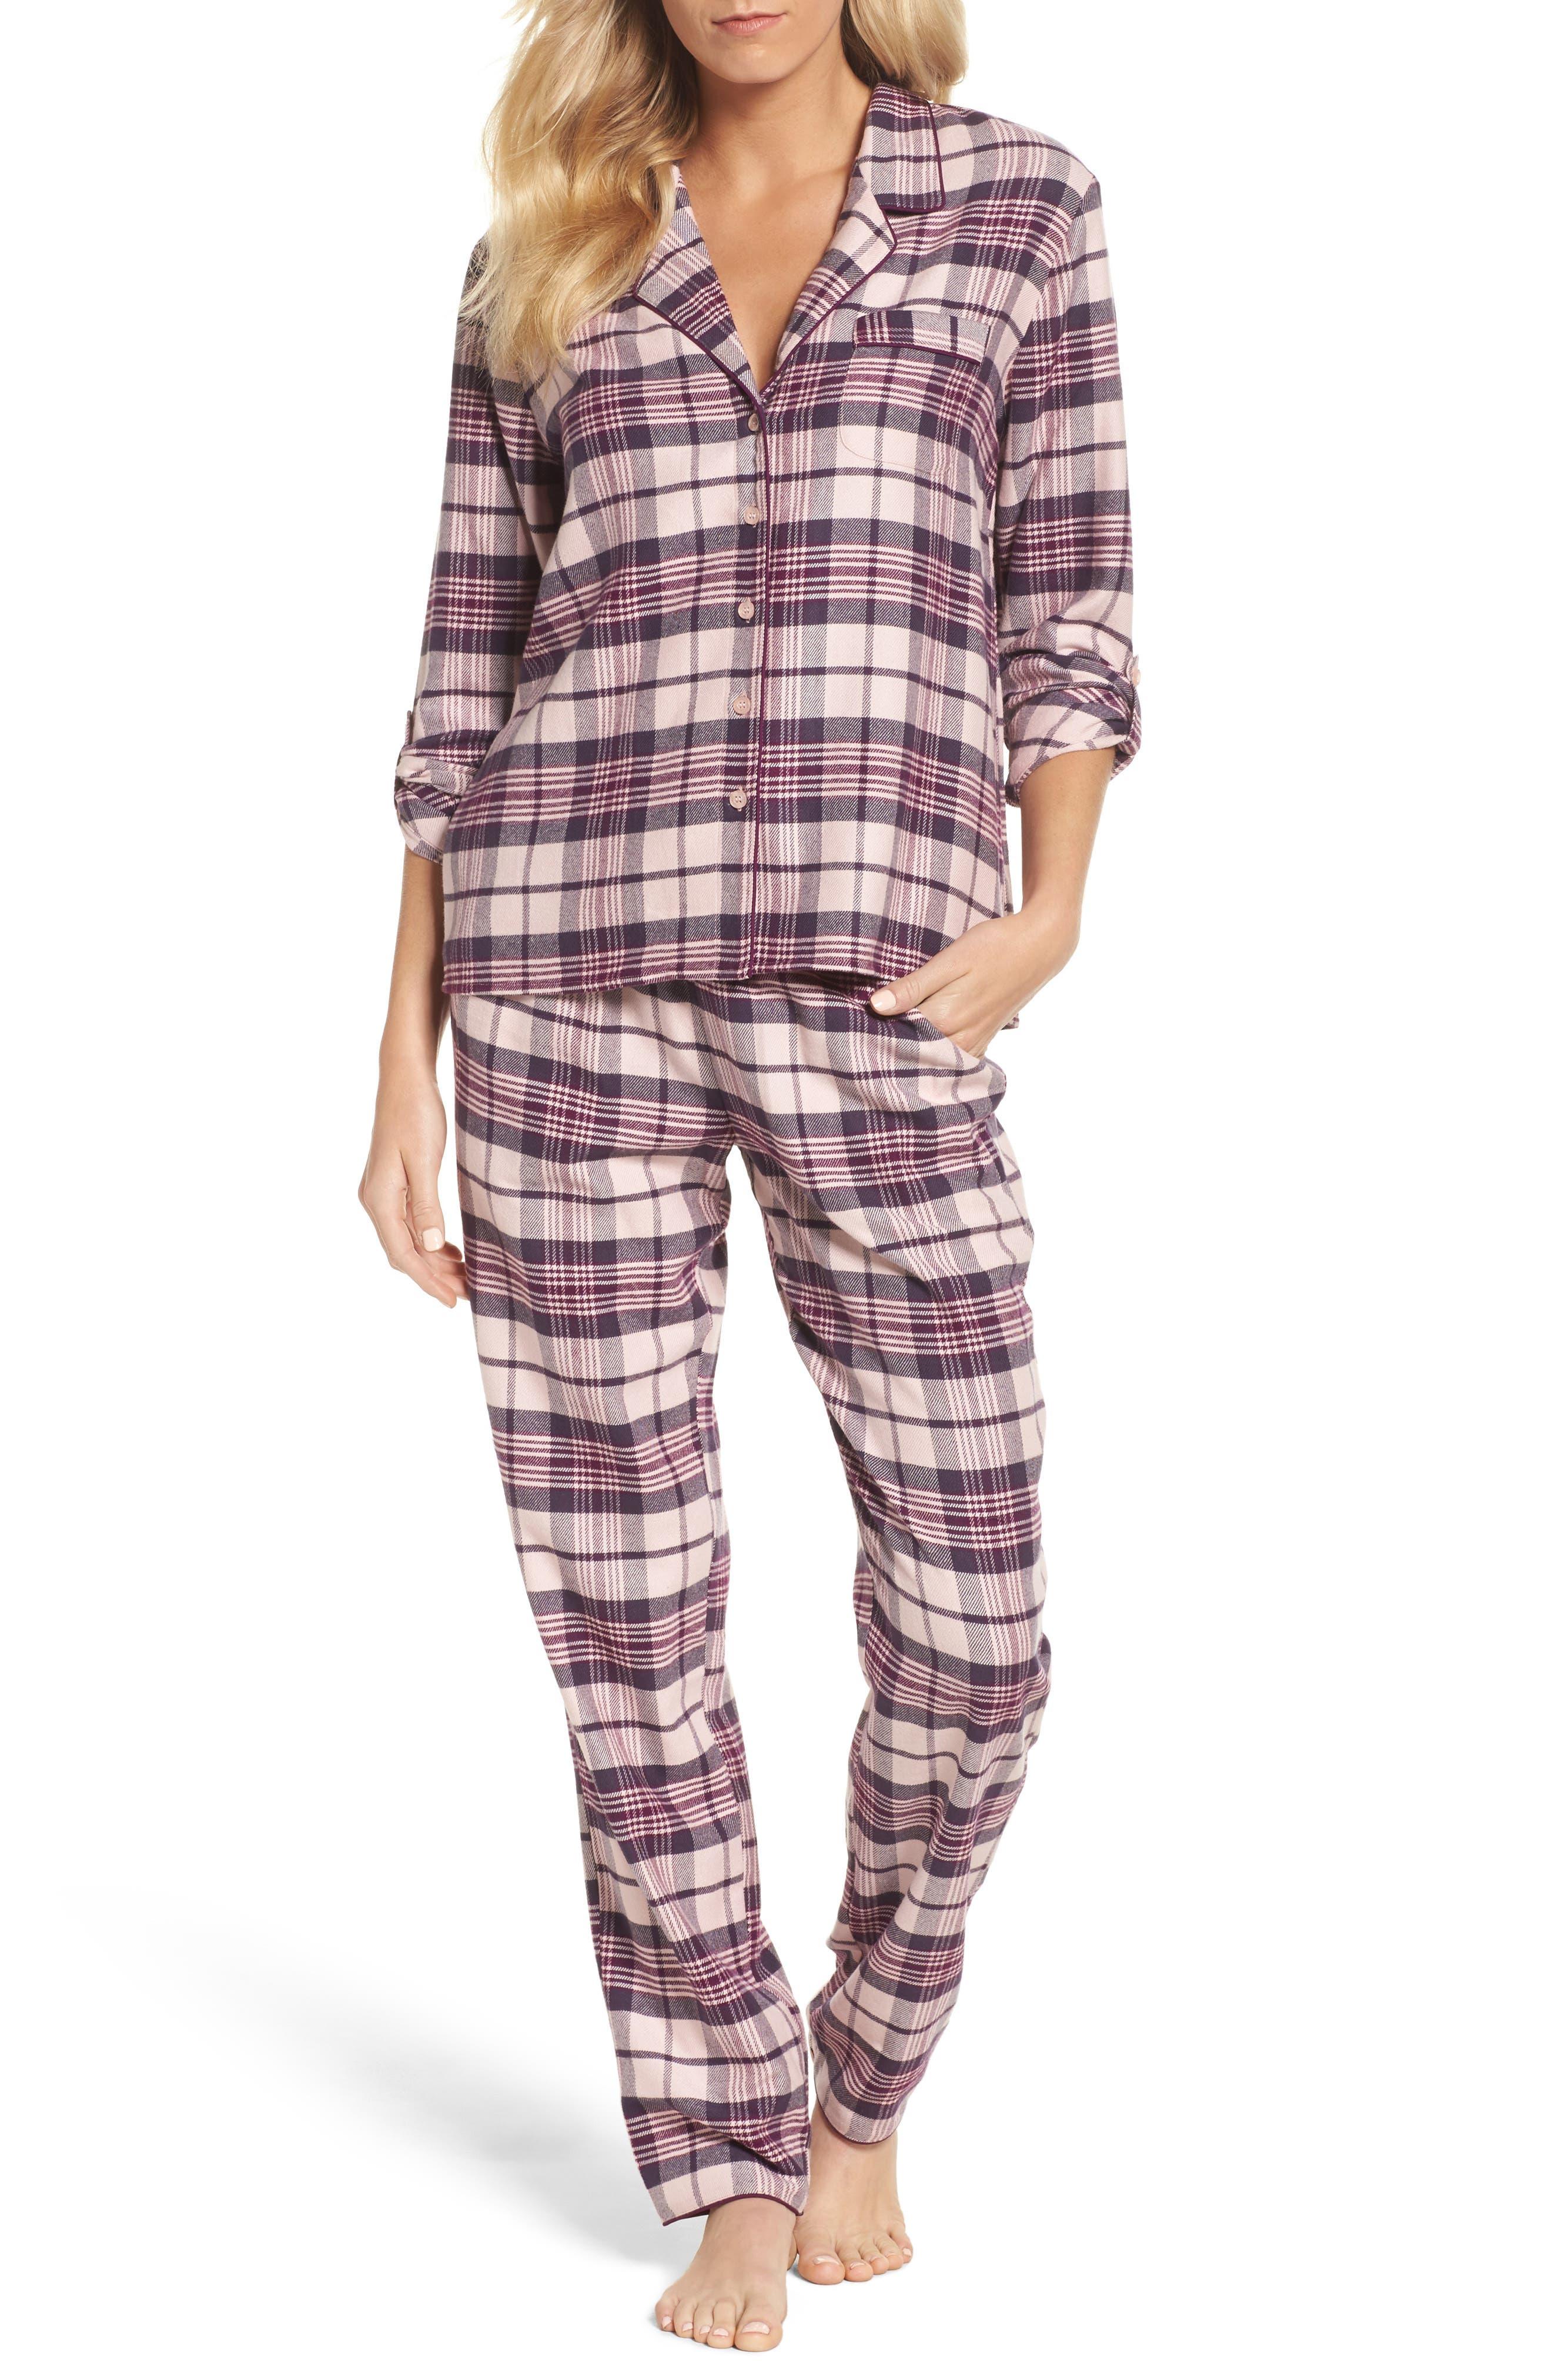 Lingerie Starlight Flannel Pajamas,                         Main,                         color, Pink Peony Bud Tonal Tartan